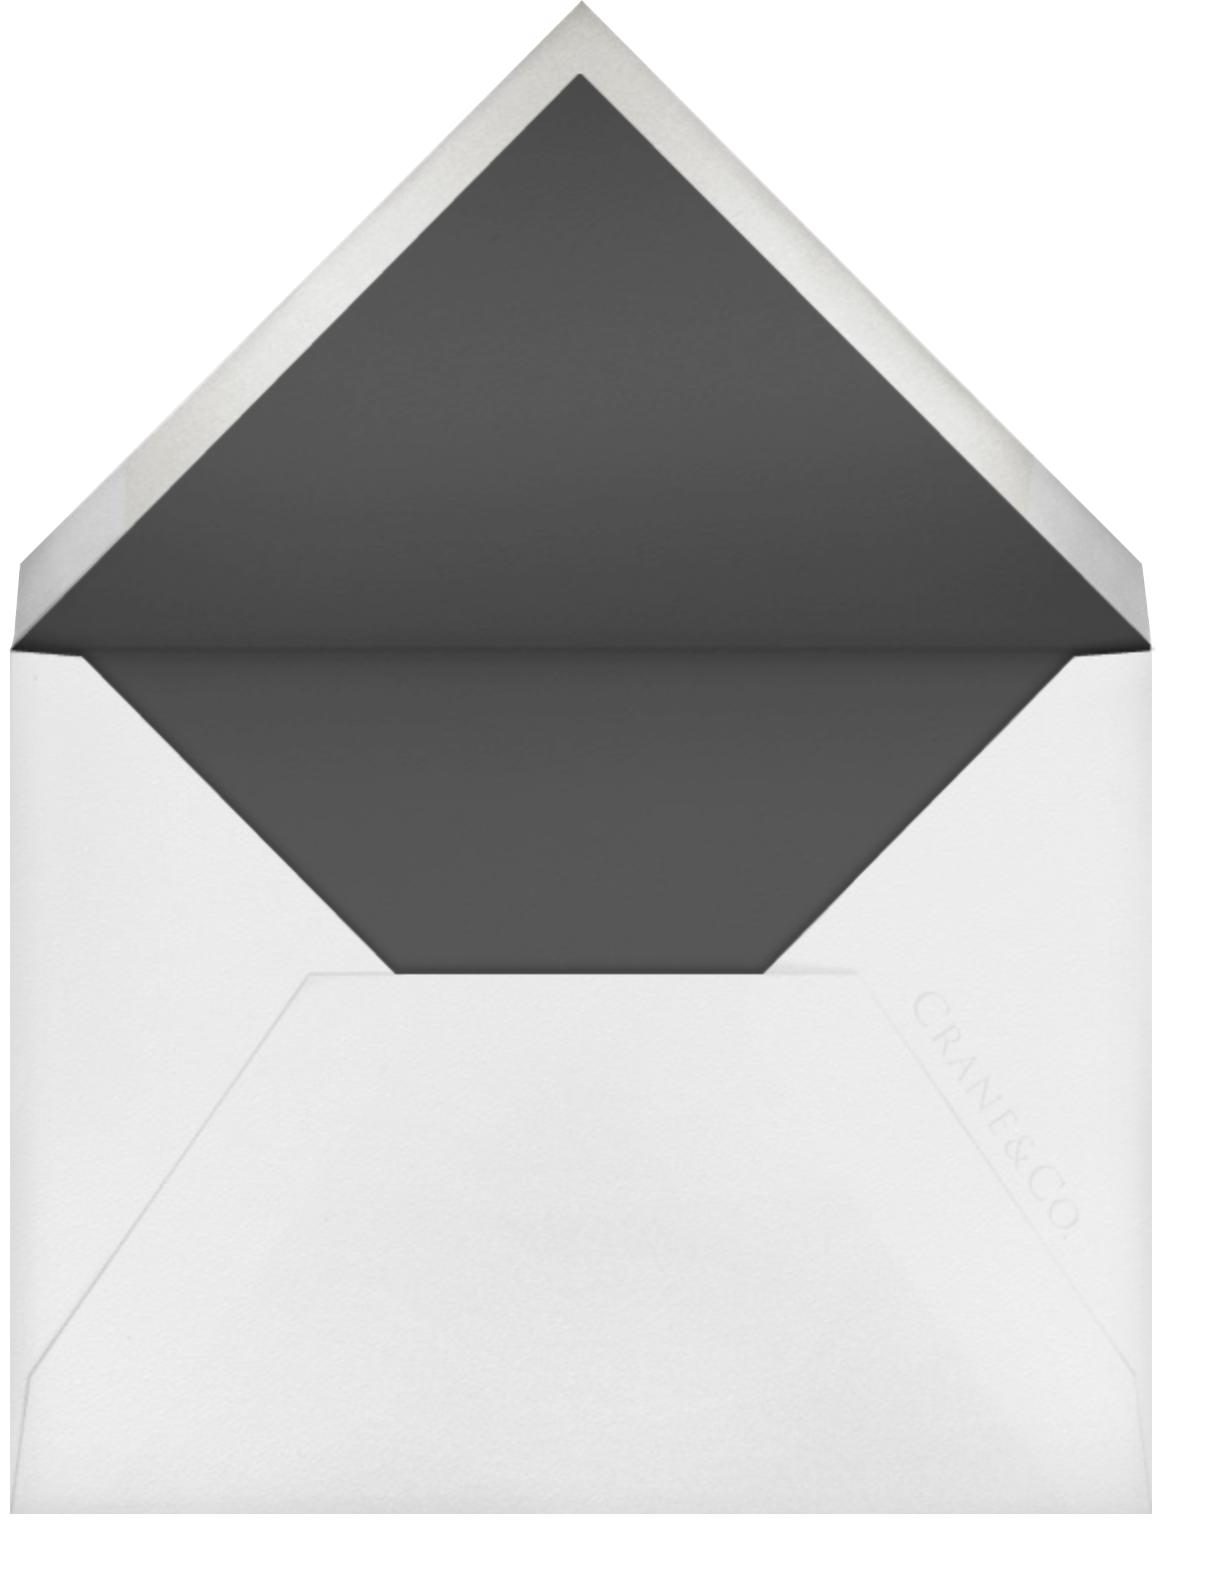 Polka Dot (Horizontal) - Medium Gold - Oscar de la Renta - Envelope